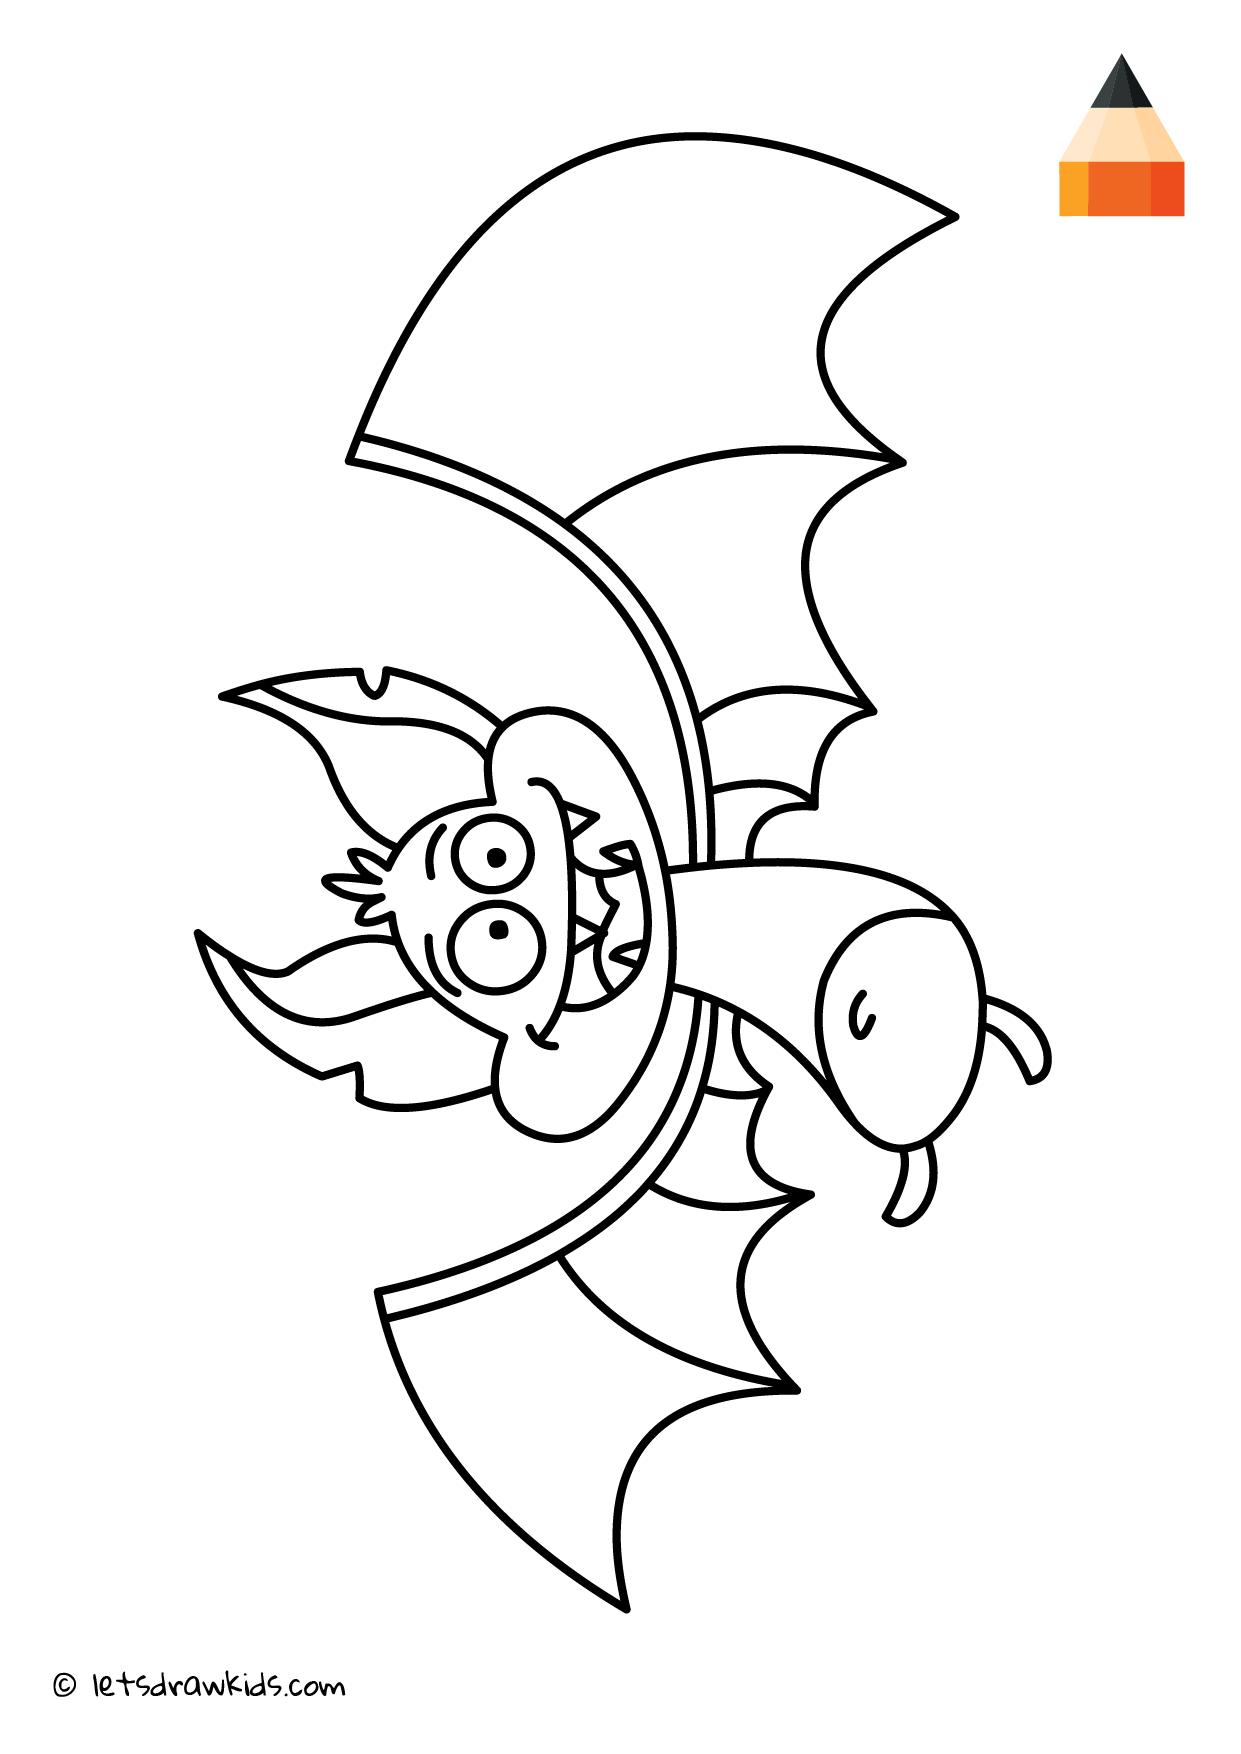 Coloring Page - Bat | Coloring pages | let\'s draw kids | Pinterest ...